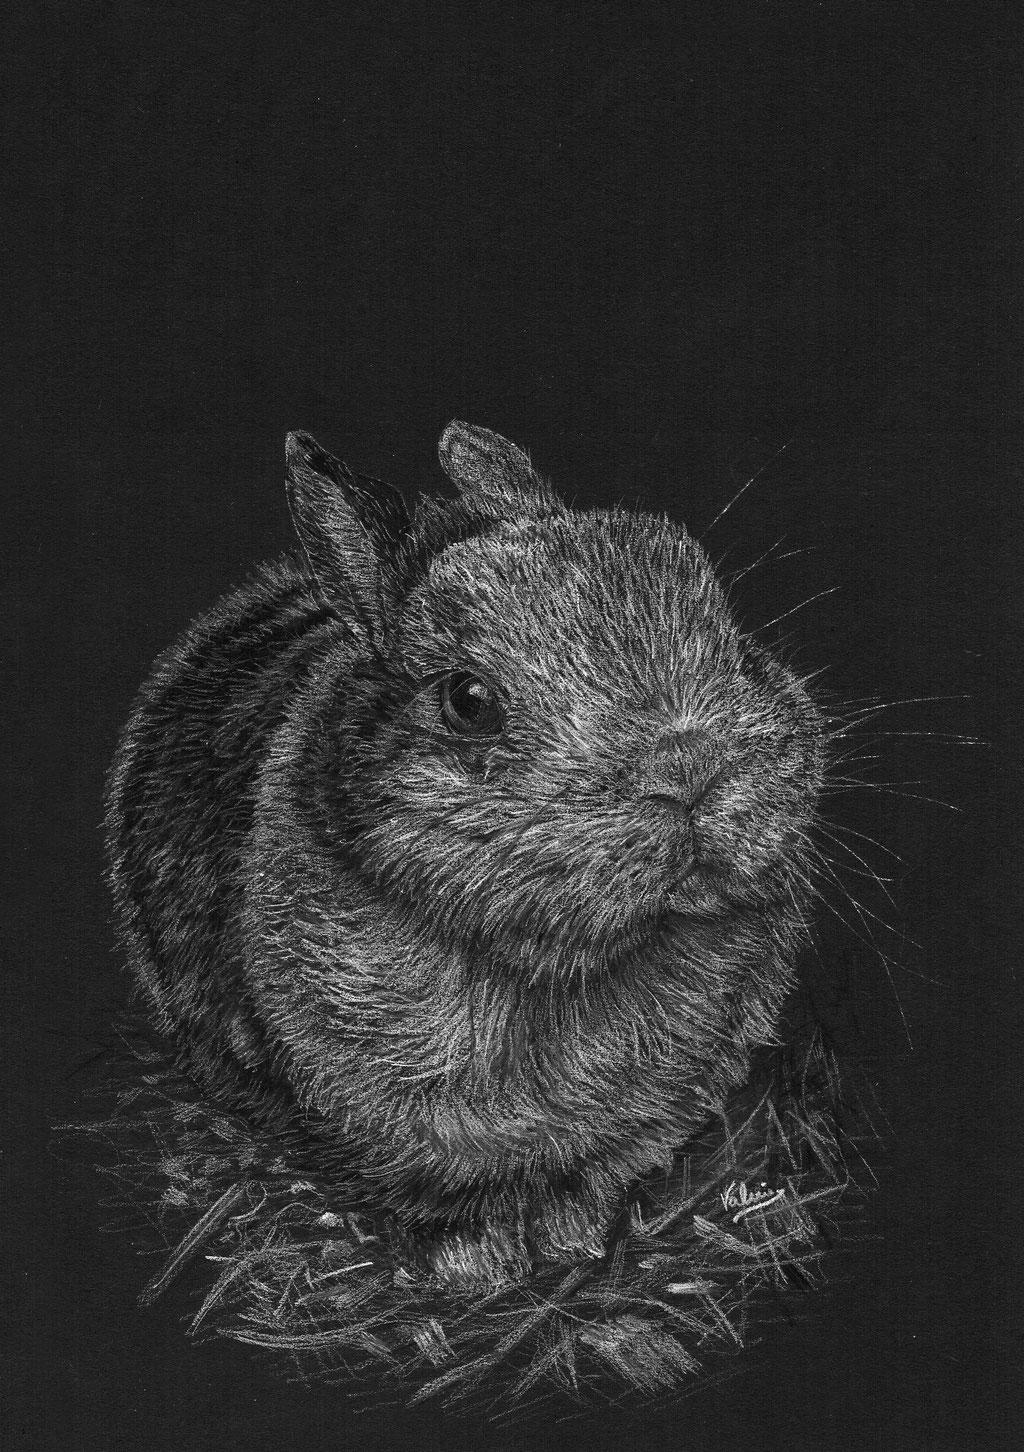 Dierenportret gevlekt konijn in stro: Wit potlood op zwart papier (2016)